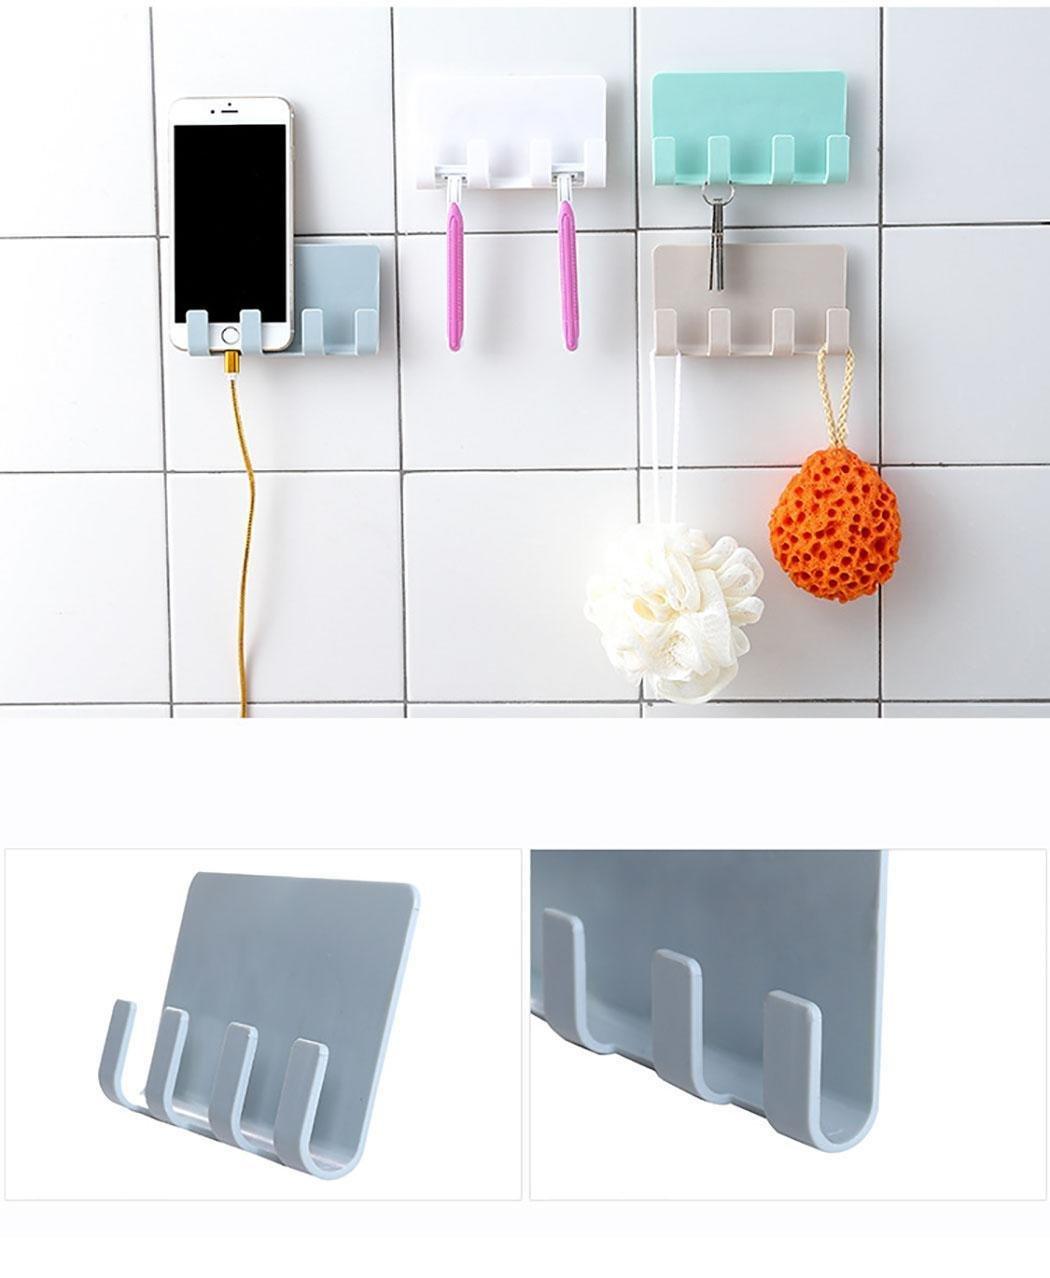 foulon Suction Office Storage Rack Hooks Solid Plast Tie Racks